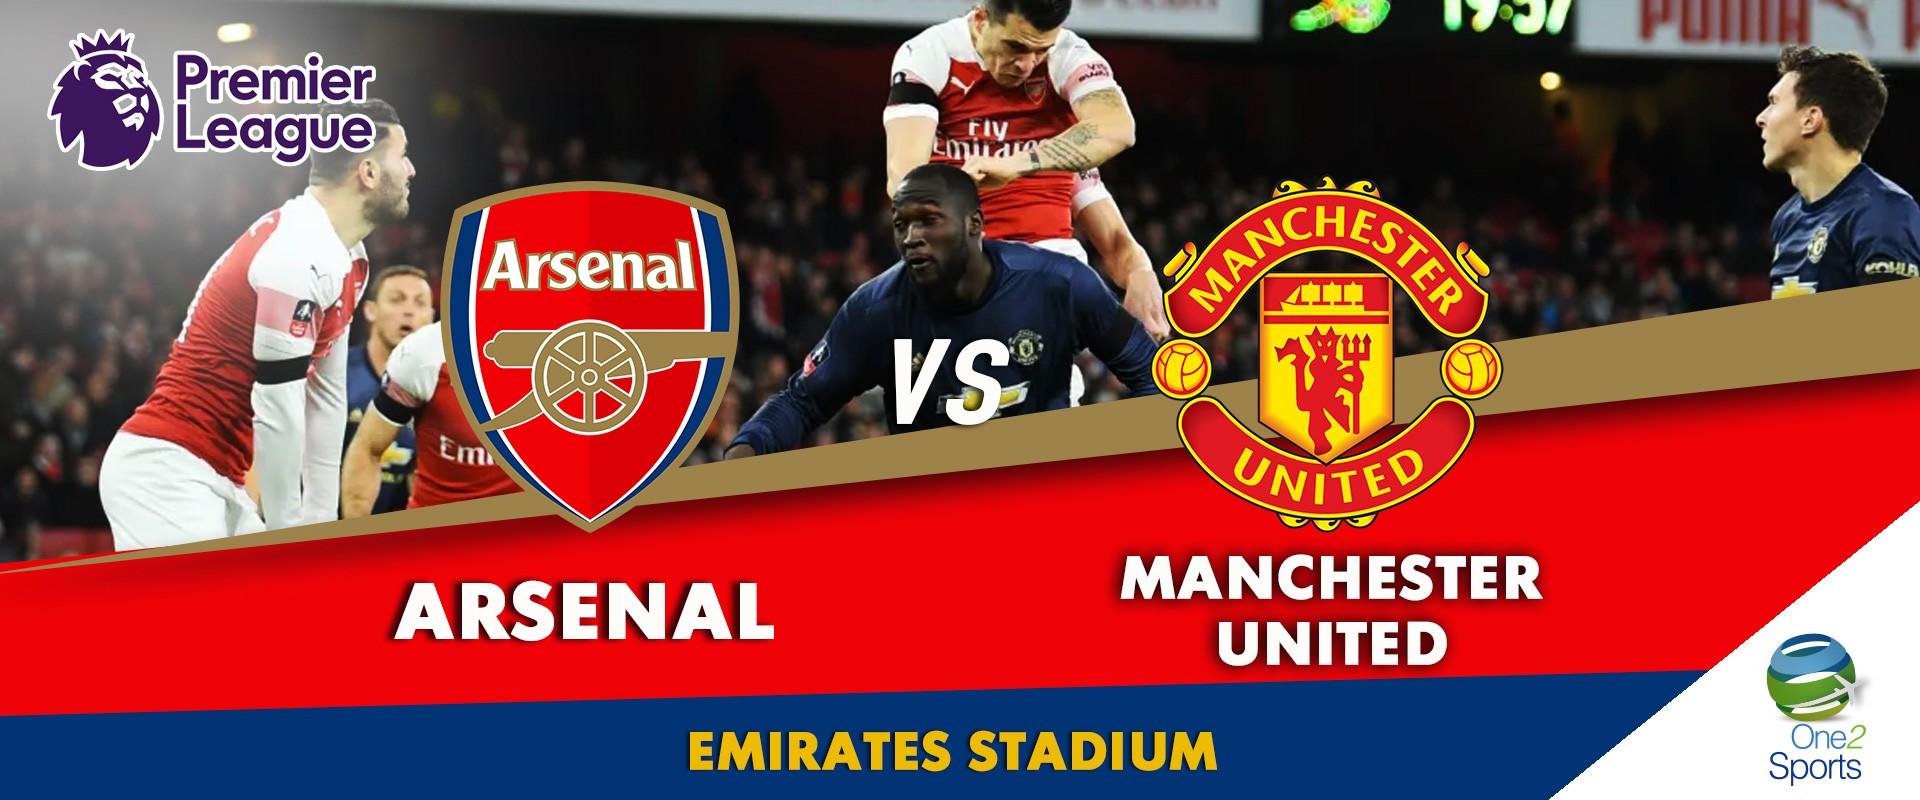 Arsenal vs Manchester United